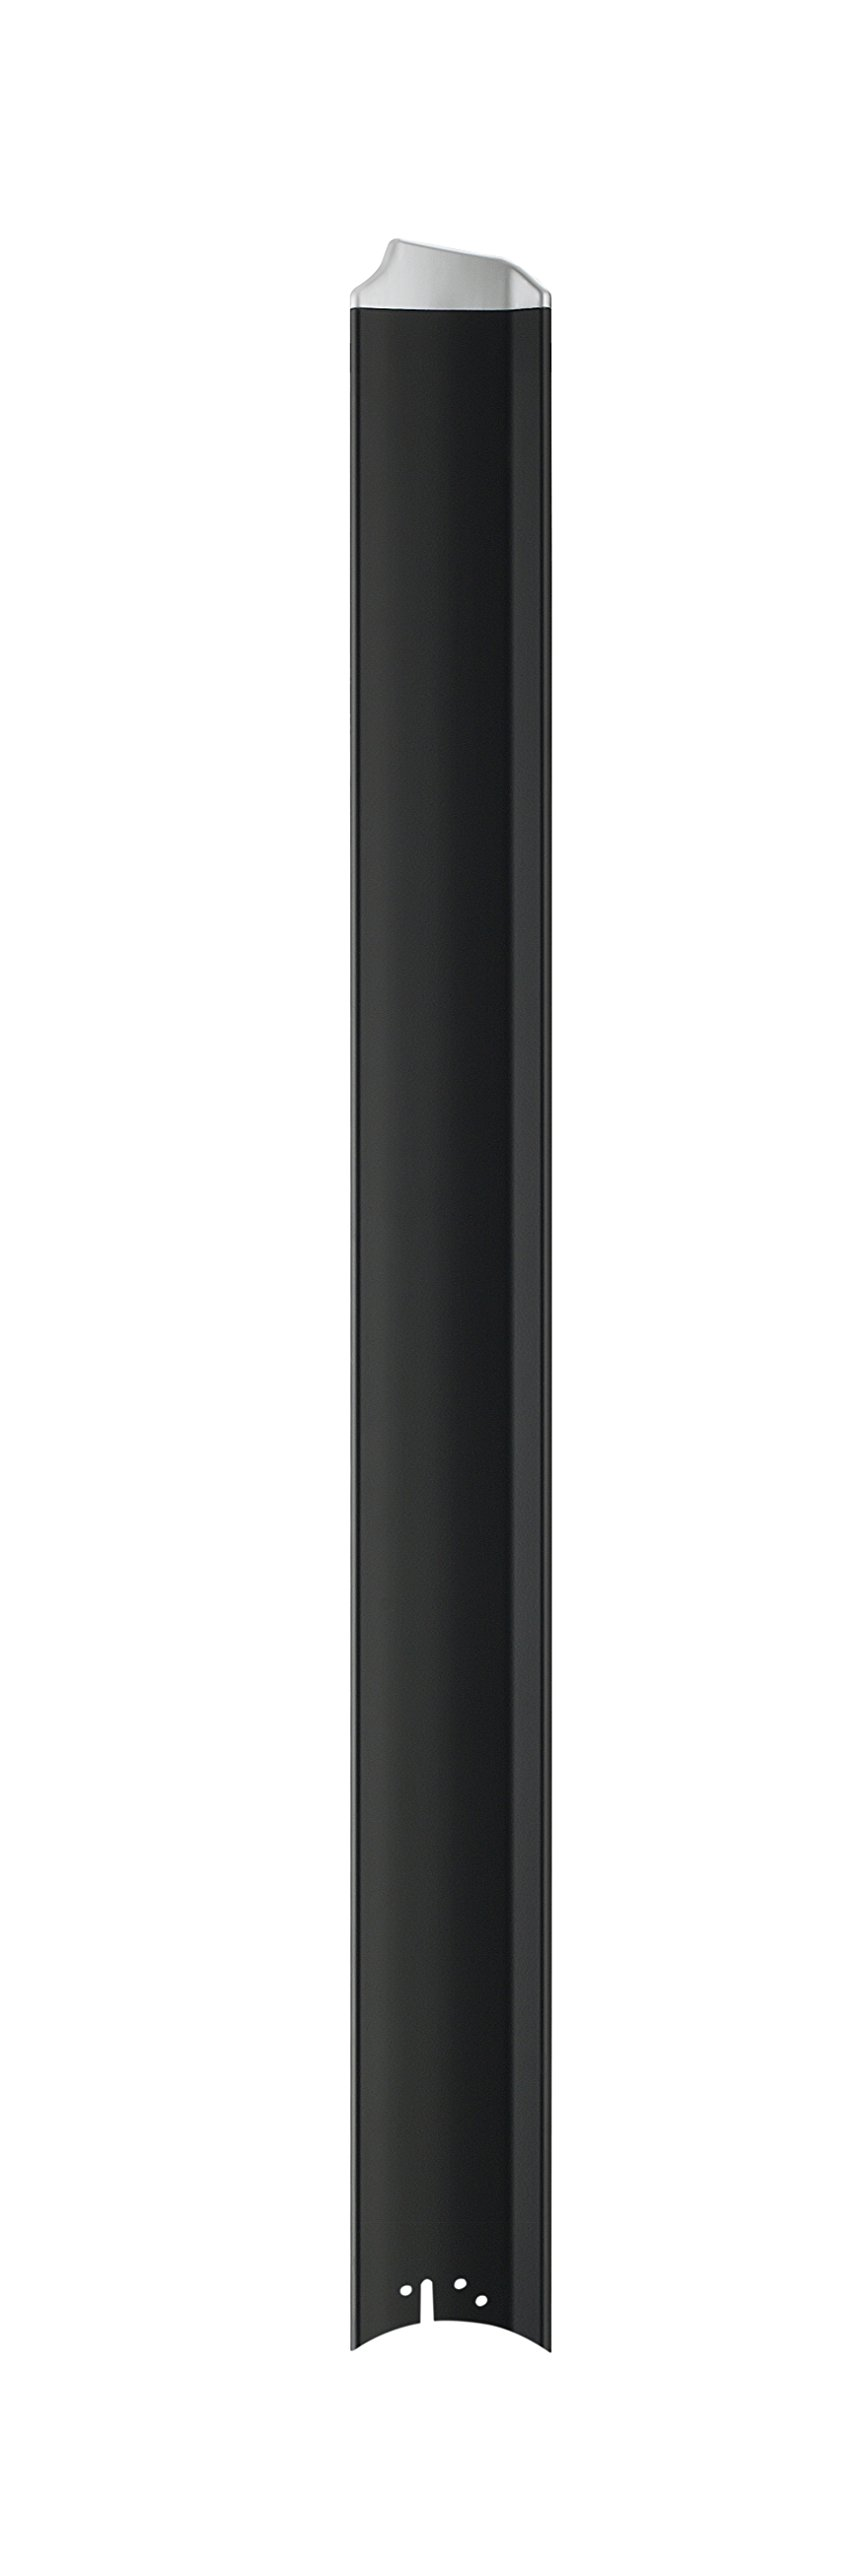 Fanimation B7997-72BLW Fan Blades, Black with Silver Tip